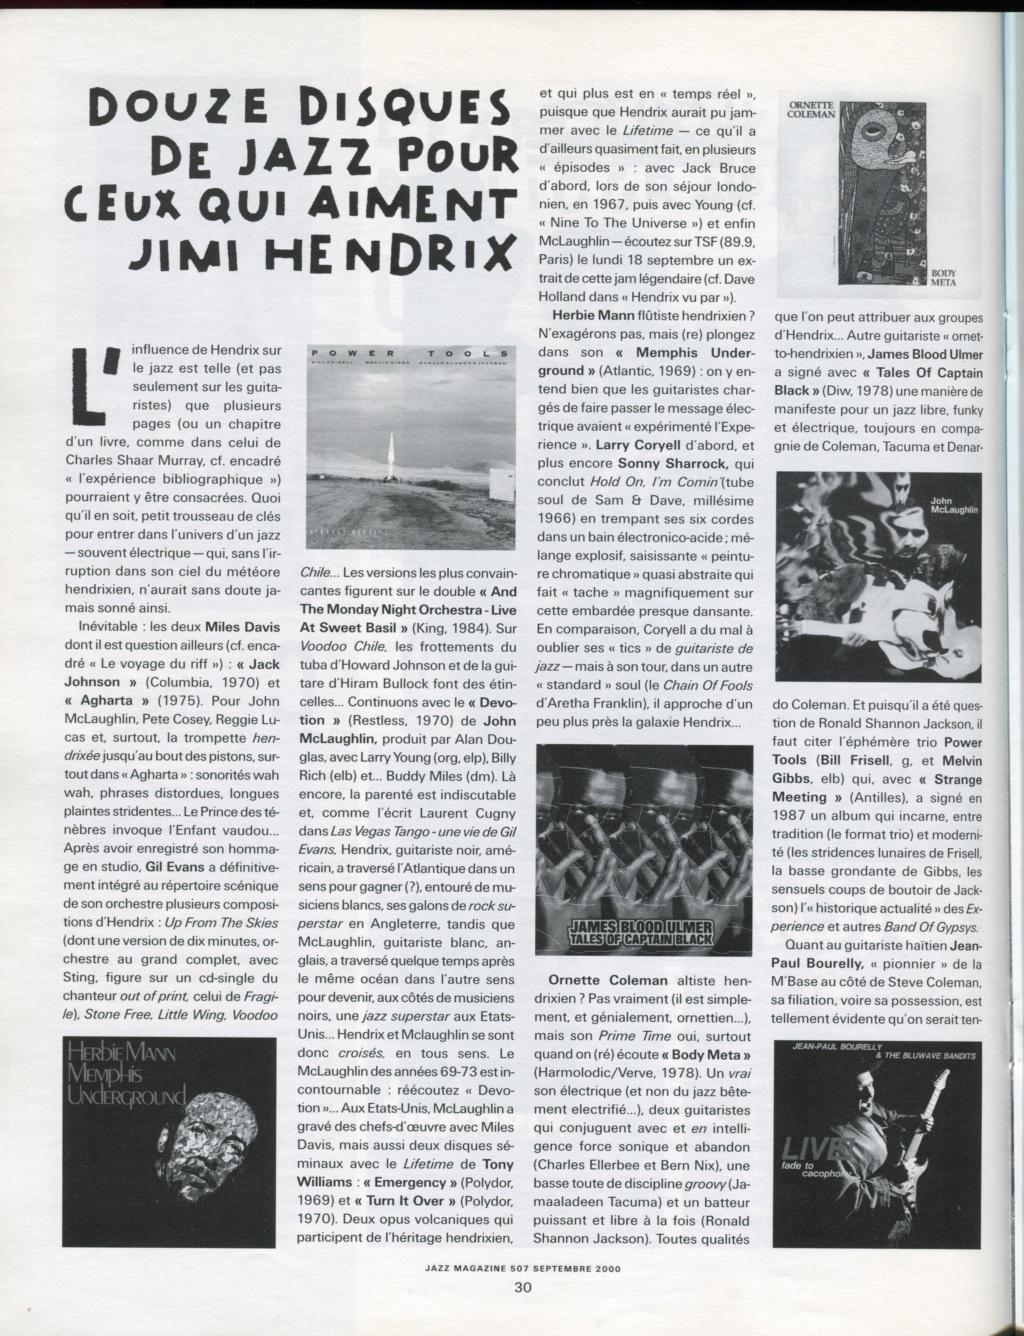 Magazines Français 1989 - 2014 - Page 2 1990_147